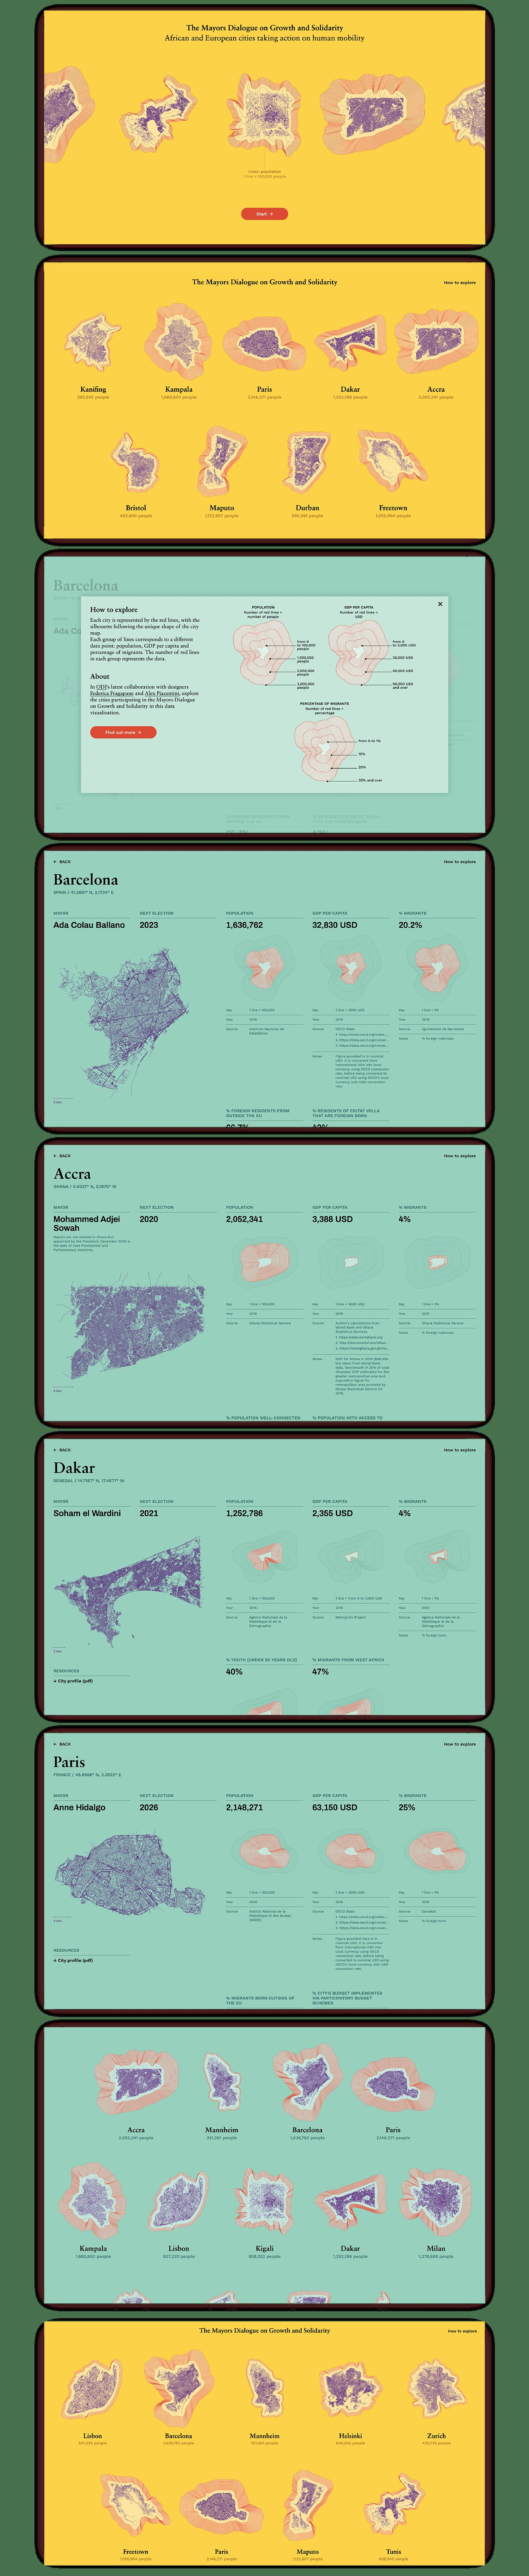 Data datavisualisation DATAVISUALIZATION infographics UI ux visualisation visualization